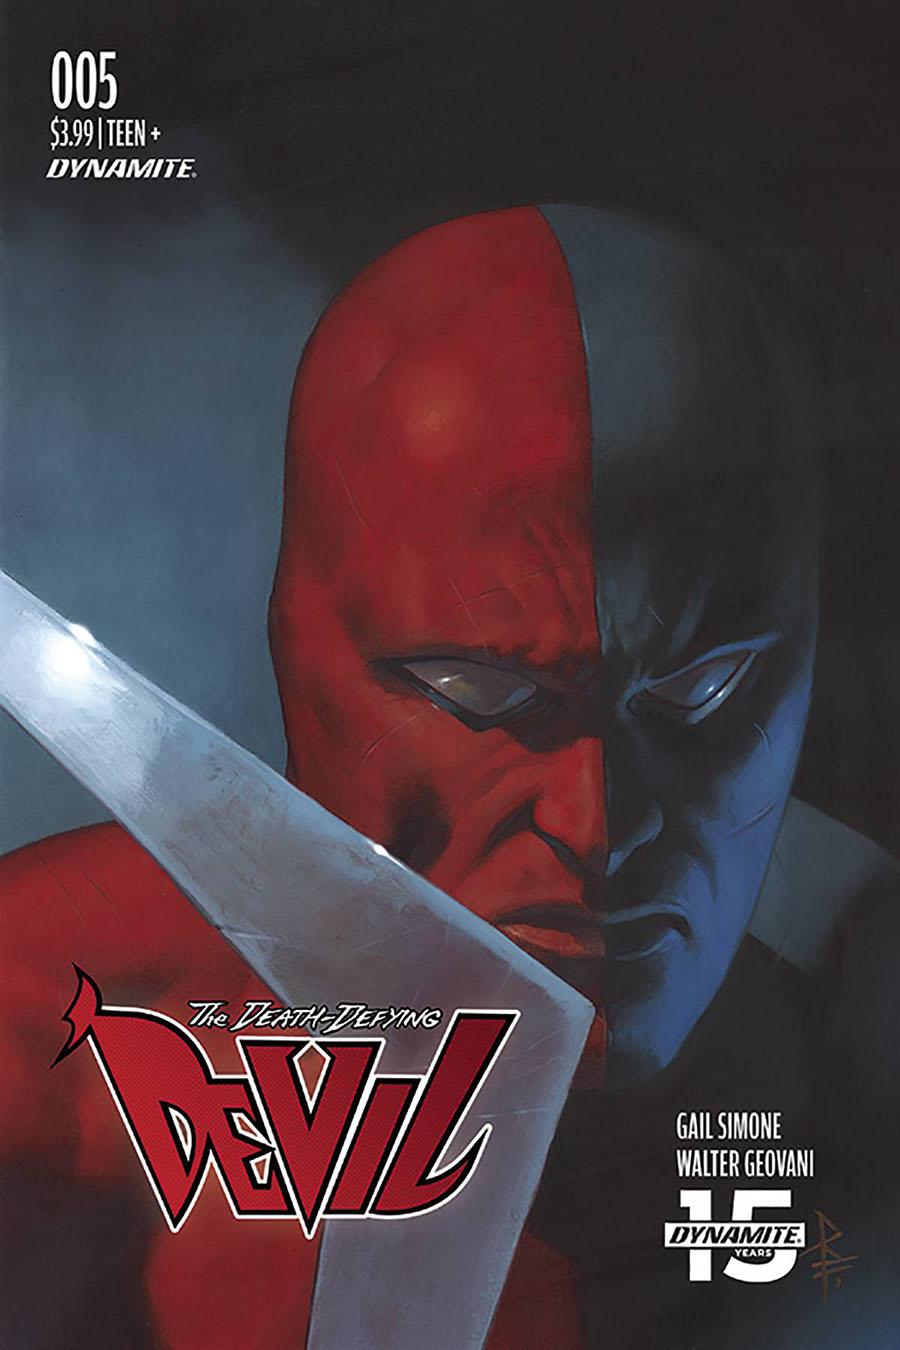 Death-Defying Devil Vol 2 #5 Cover C Variant Riccardo Federici Cover